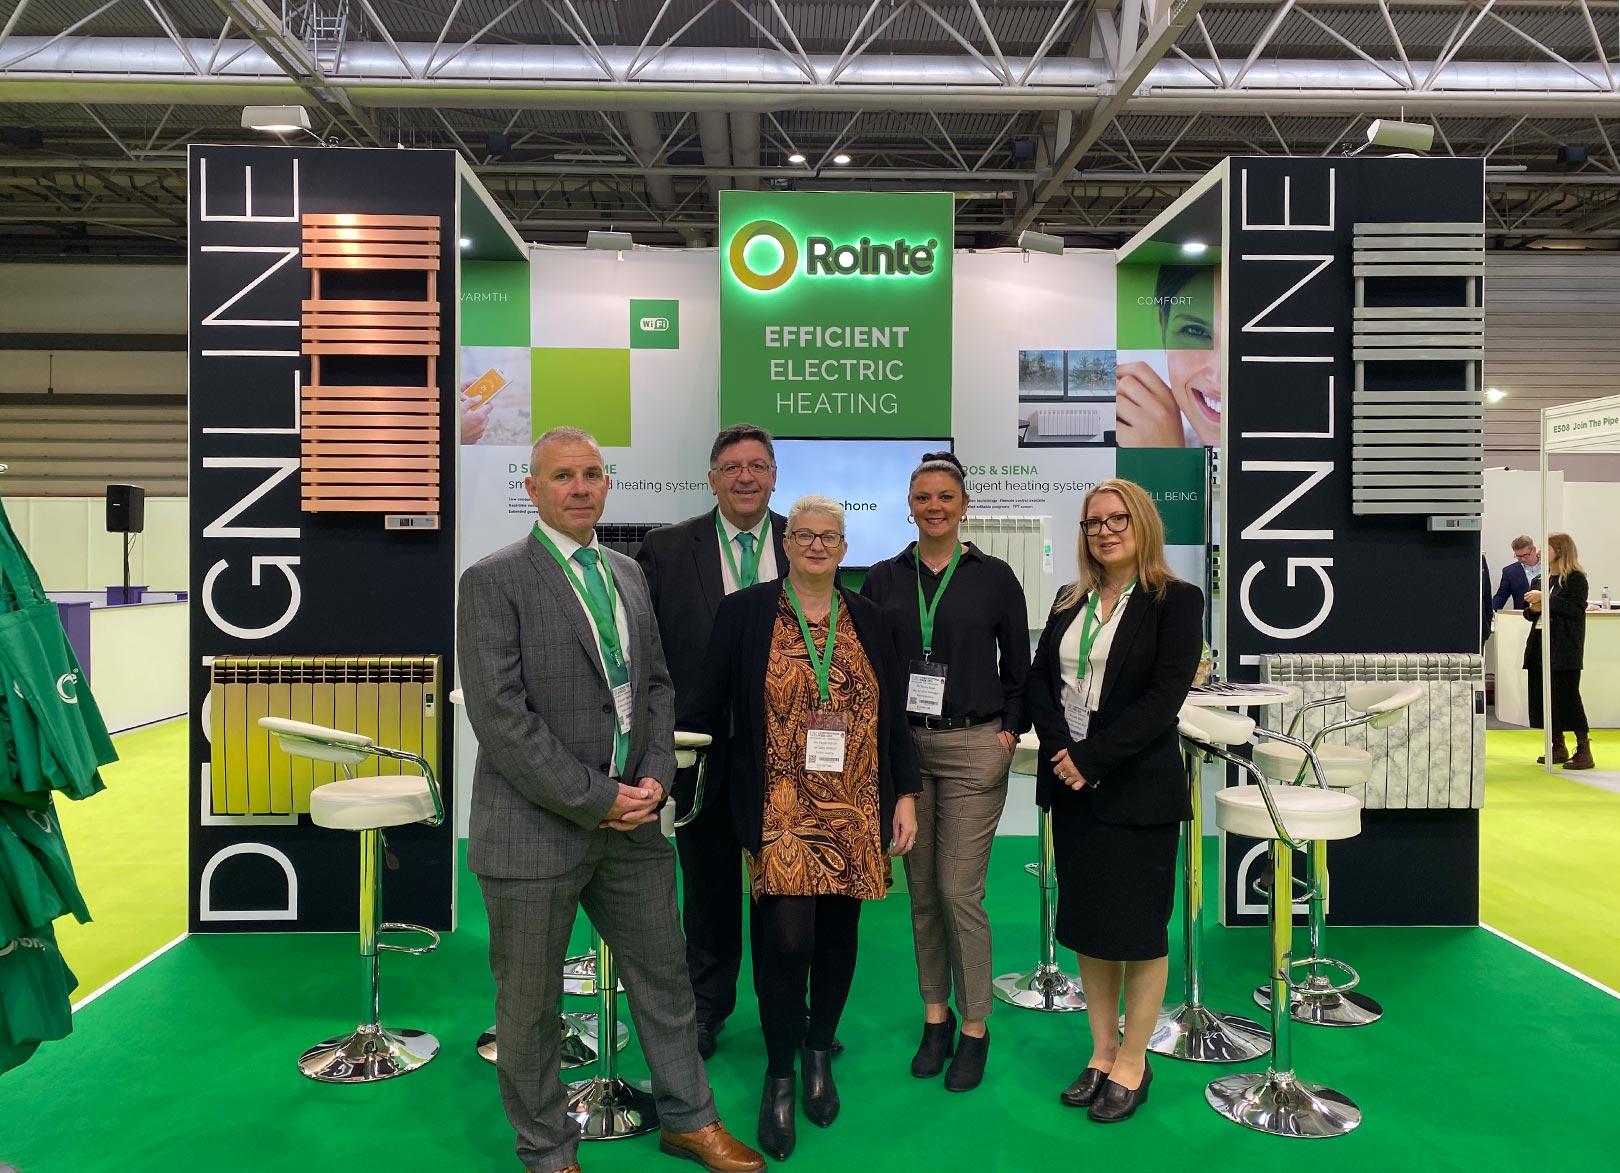 Rointe heating team exhibiting at UK construction week 2019